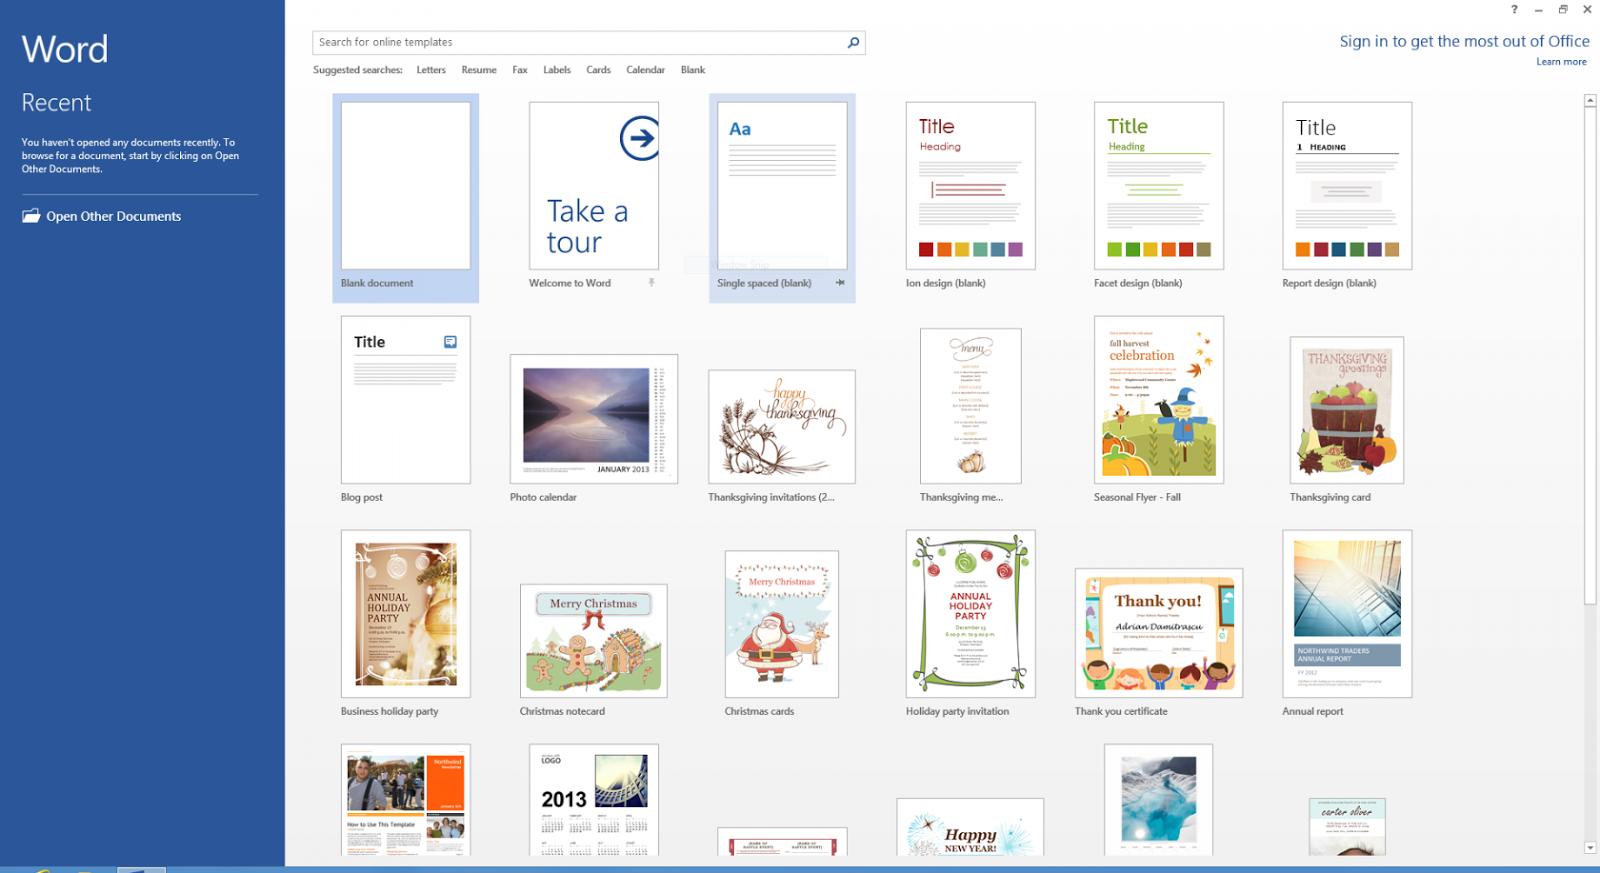 microsoft office 2013 free download for windows 8.1 32 bit